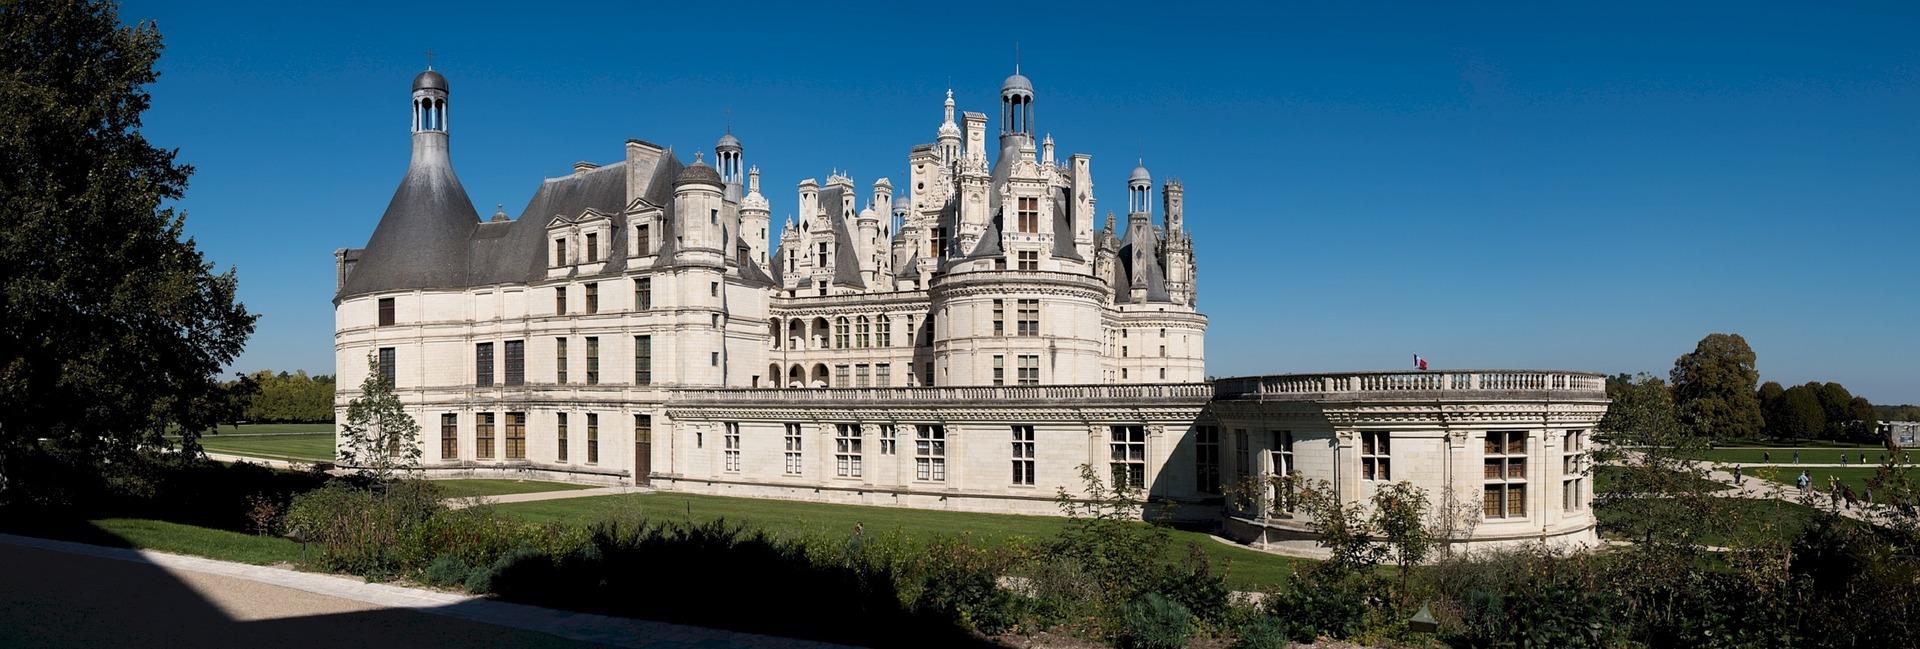 chateau-chambord-france